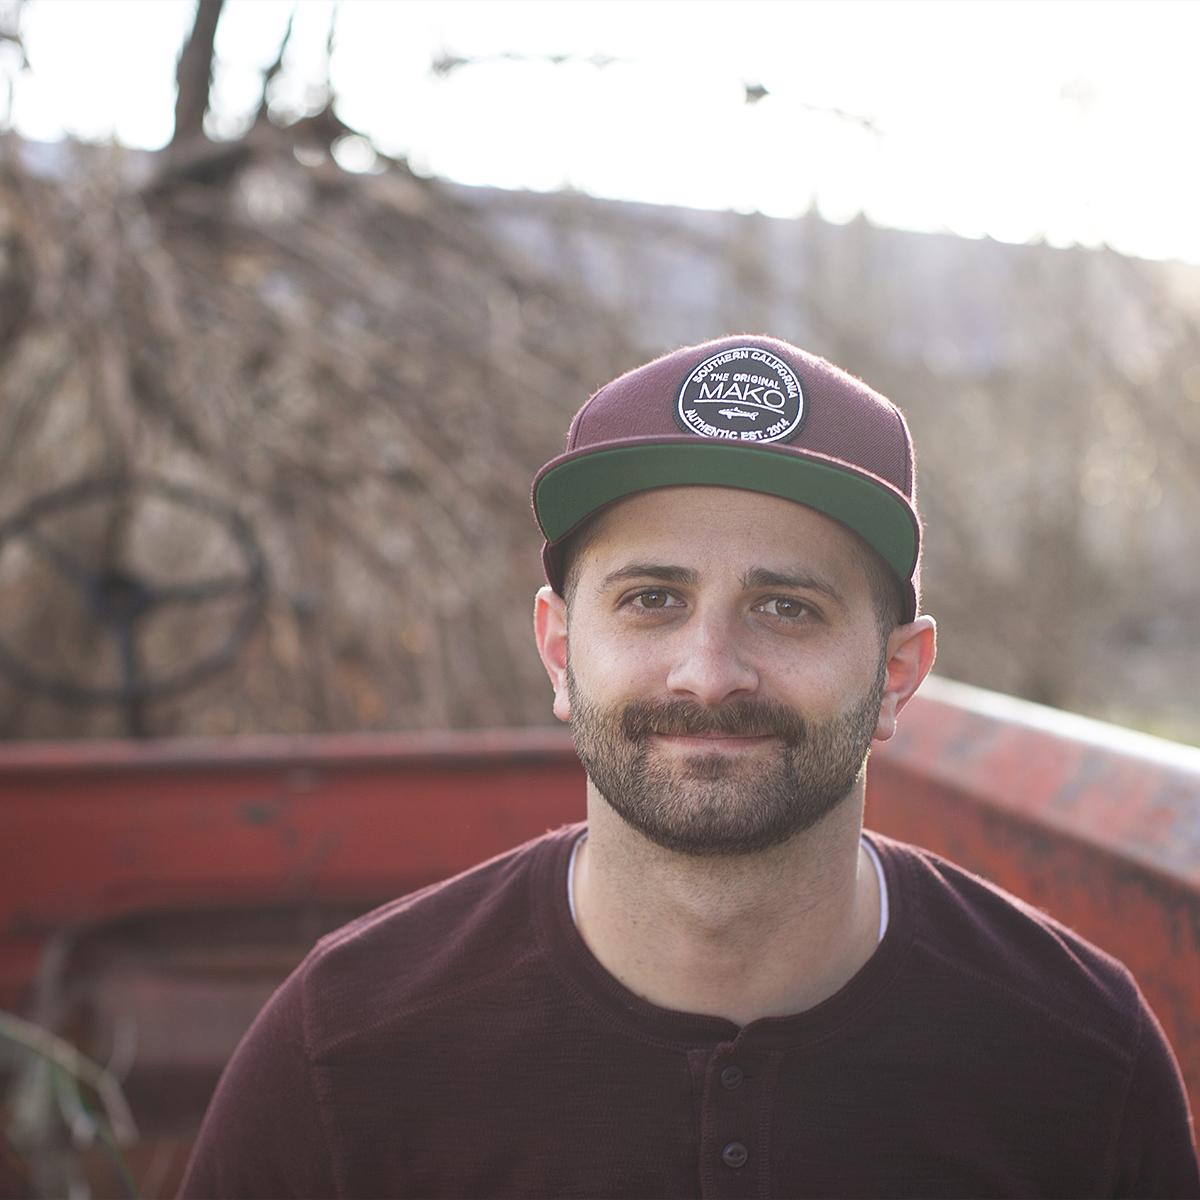 Jake NackosCo-Founder